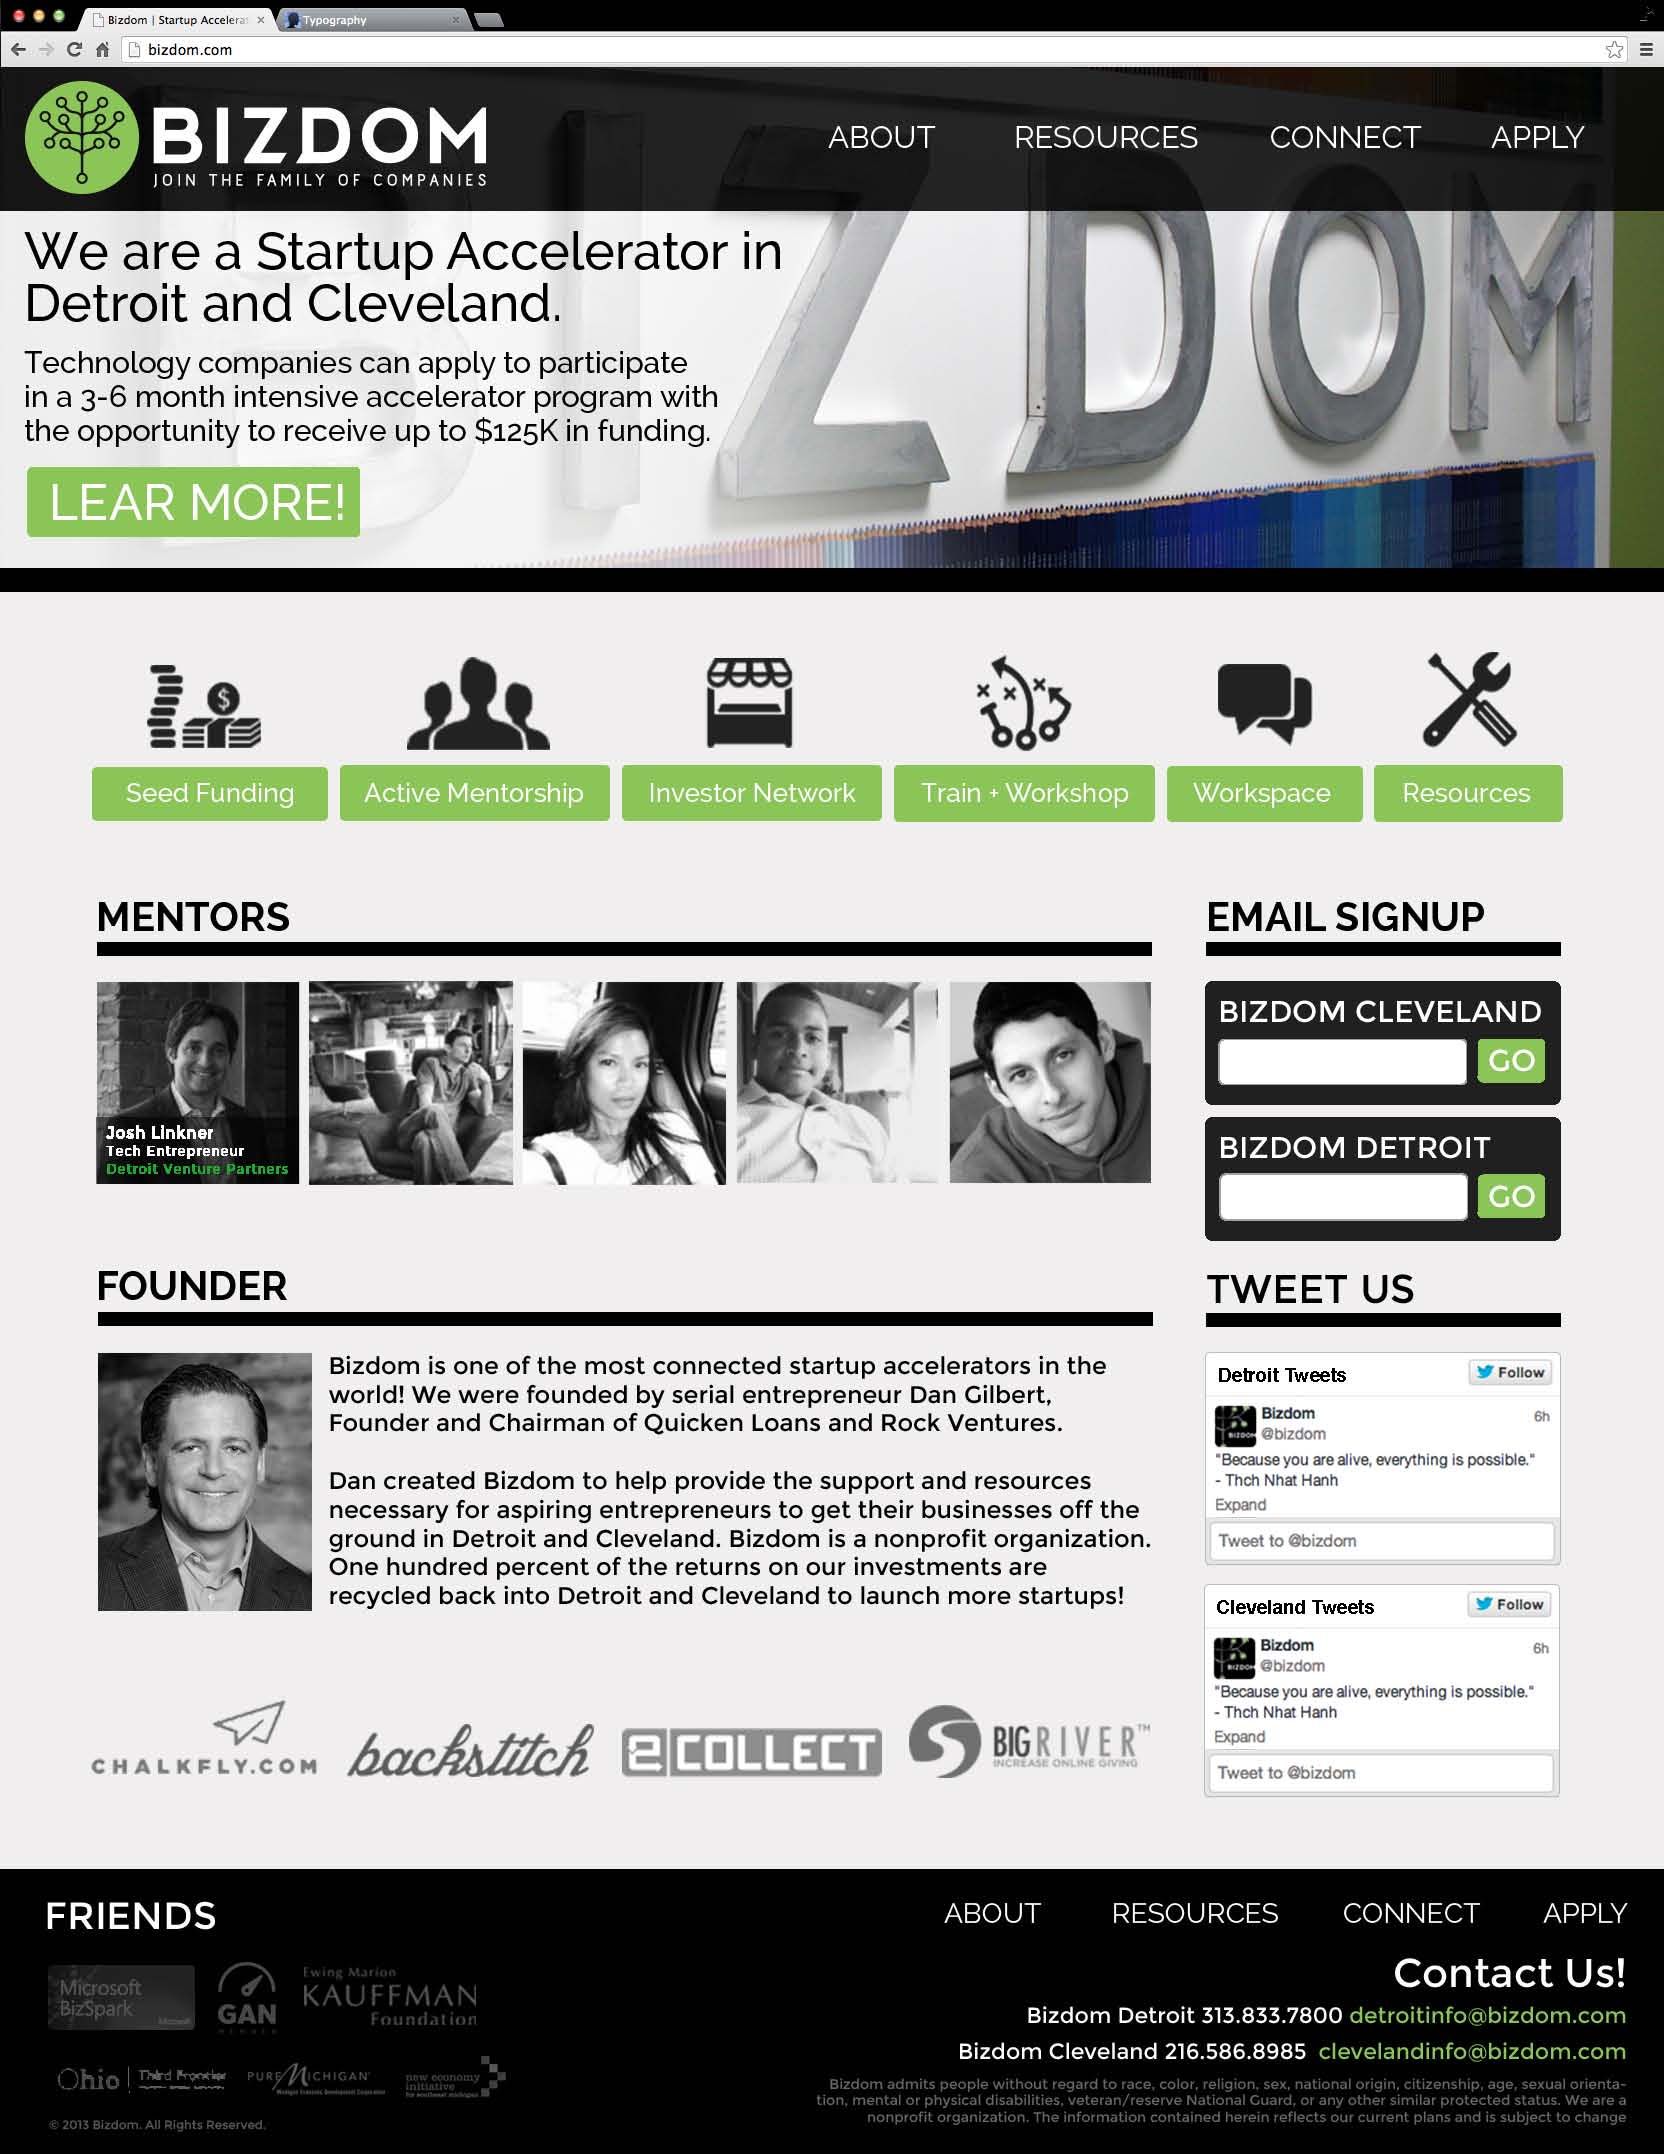 bizdom-home-mockup-page